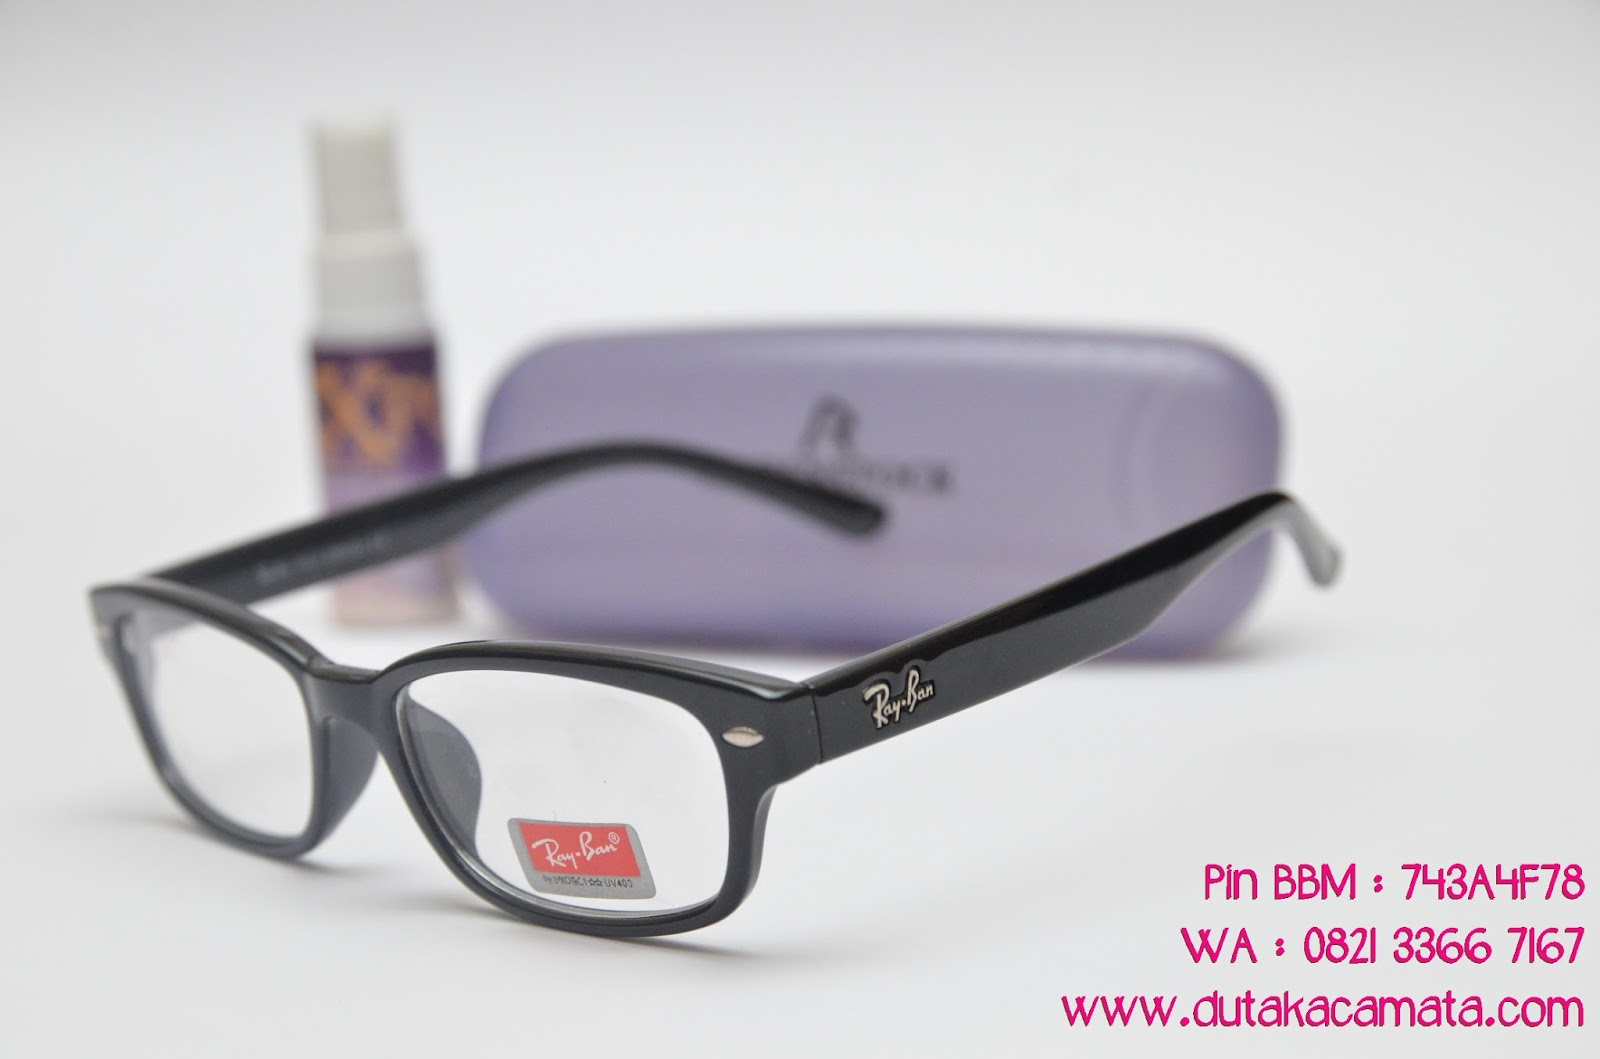 Rayban 5 Toko Jual Frame Kacamata Minus Murah Online Dari